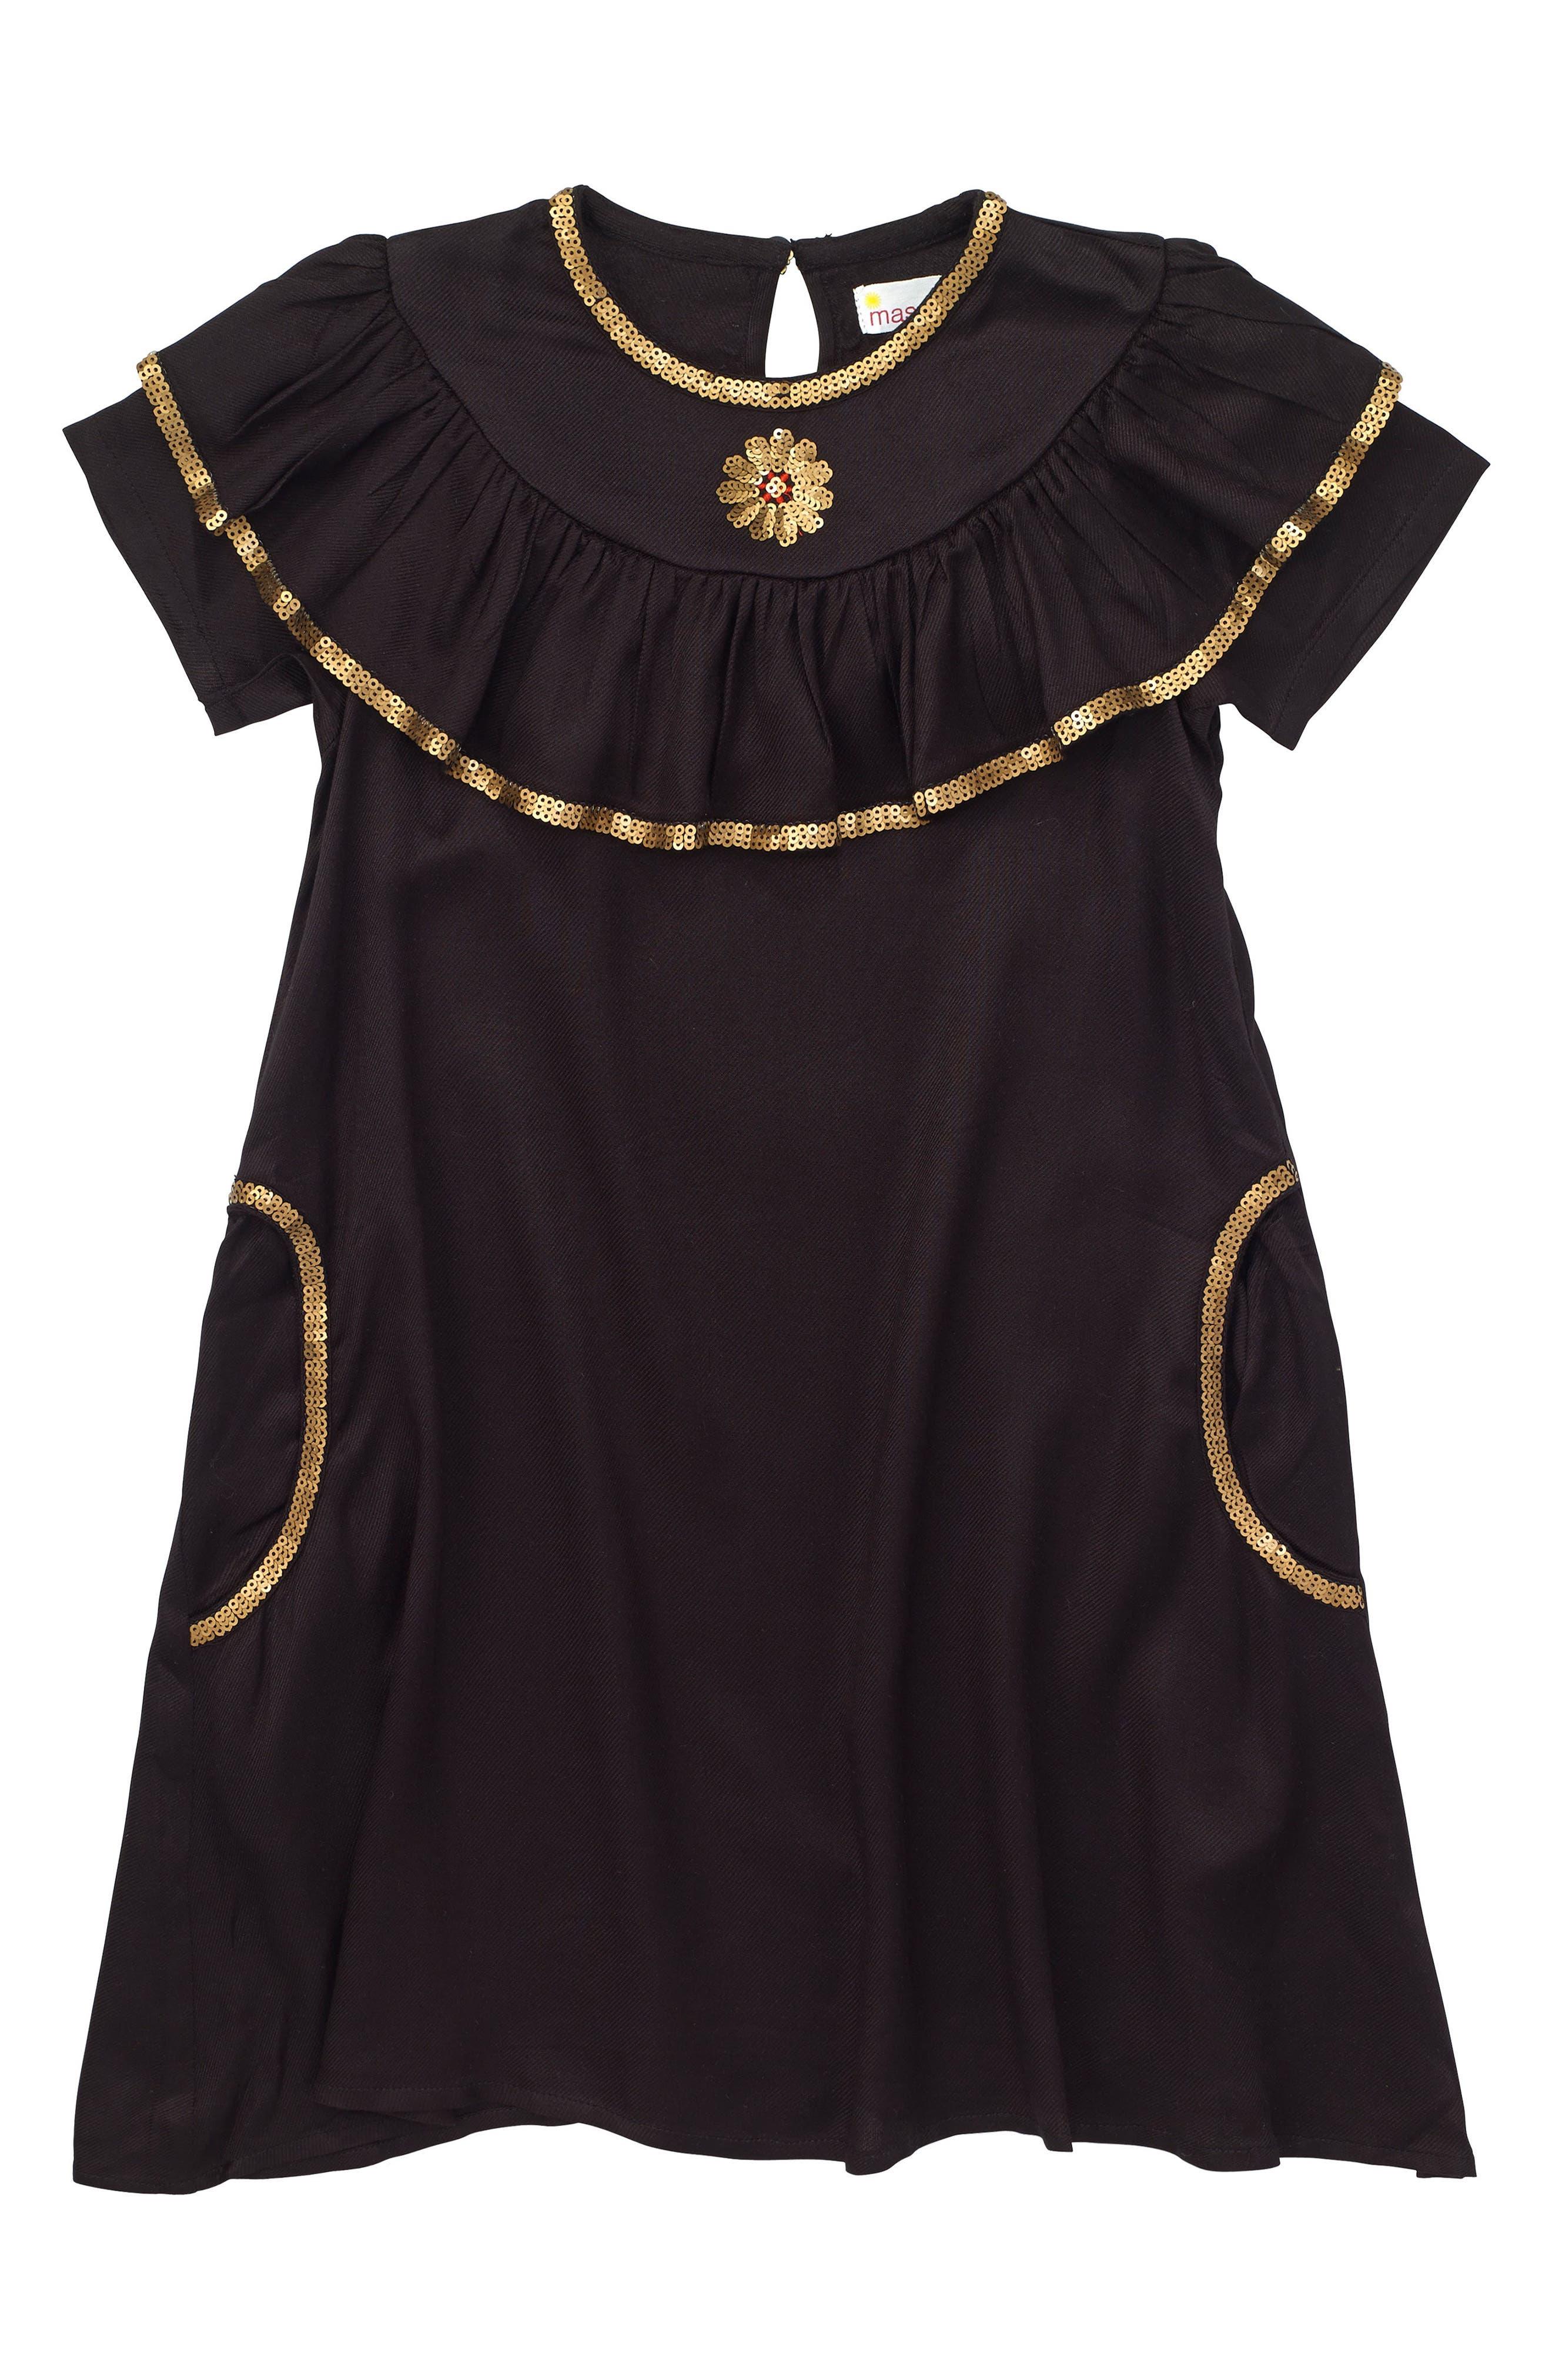 Enchanted Dress,                             Alternate thumbnail 2, color,                             001